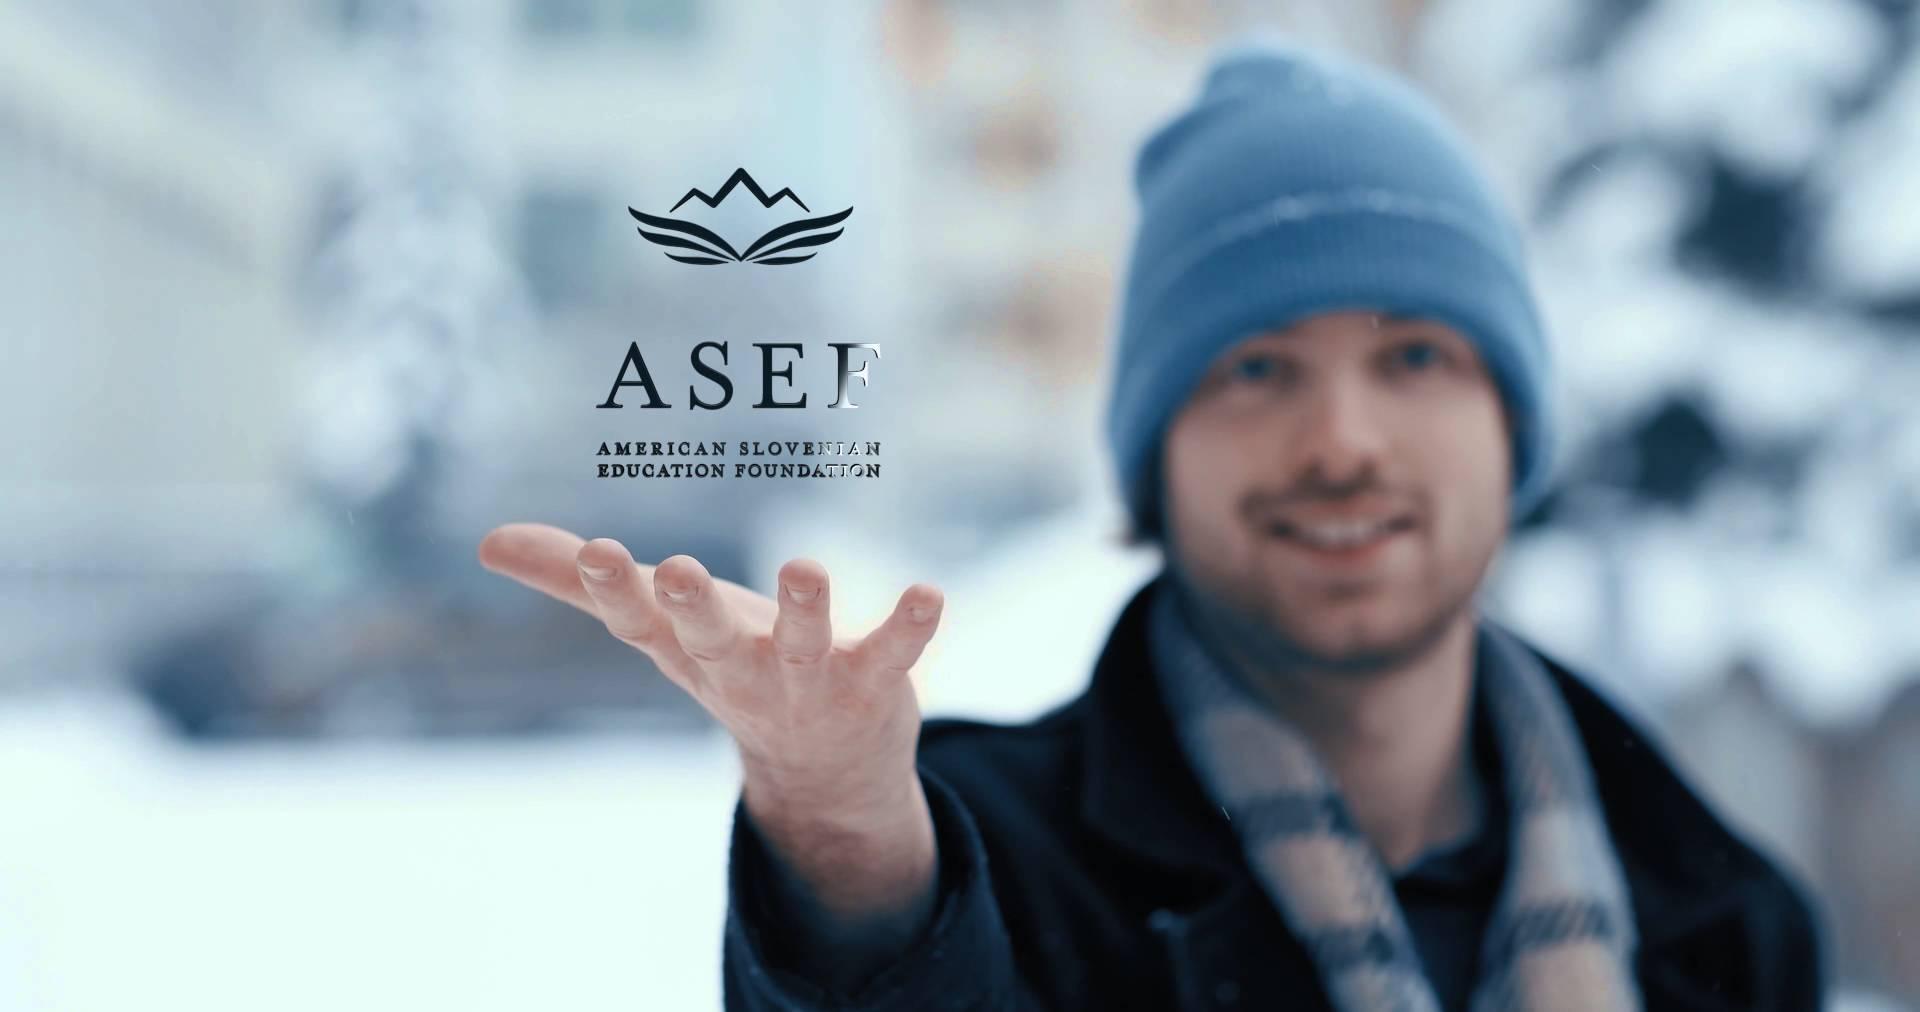 ASEF-Slovenia sign memorandum of co-operation